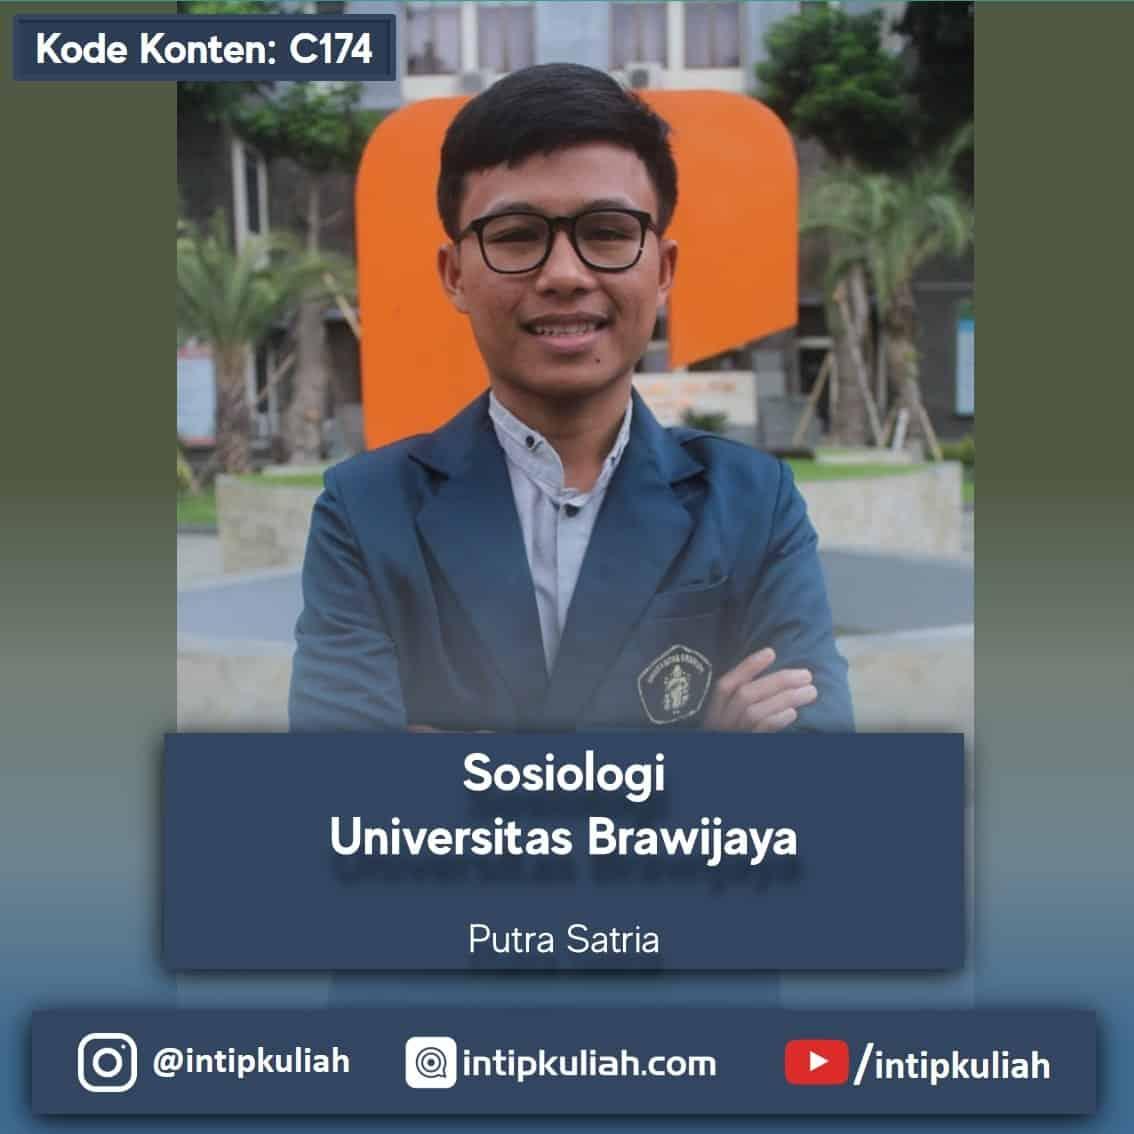 Sosiologi Universitas Brawijaya (Satria)